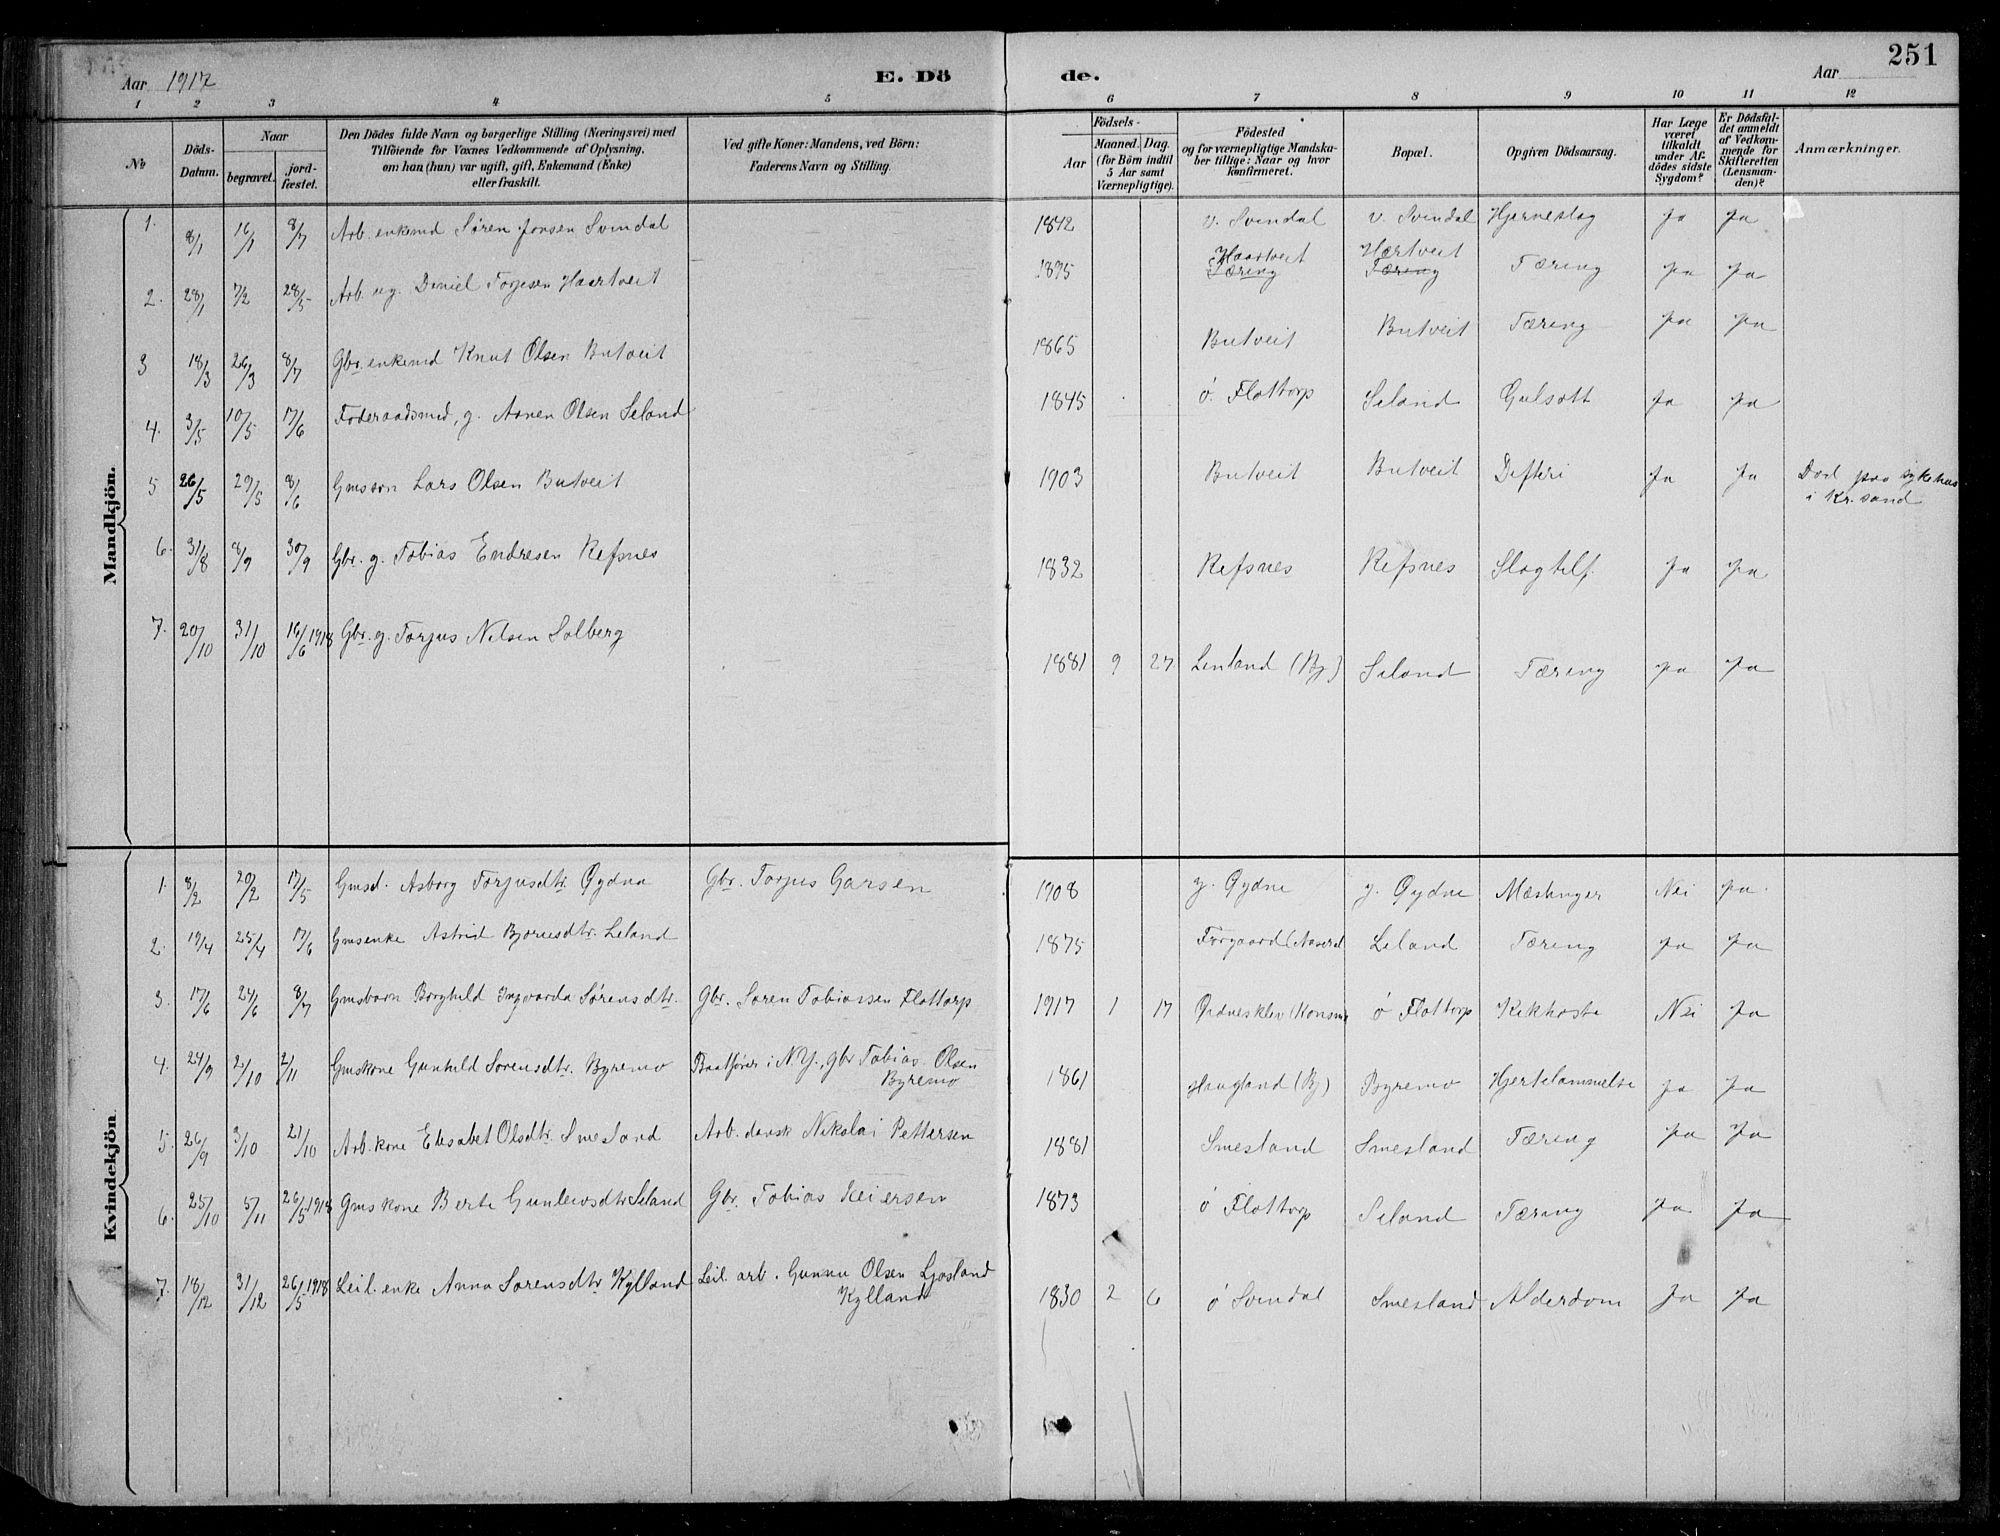 SAK, Bjelland sokneprestkontor, F/Fb/Fbc/L0003: Klokkerbok nr. B 3, 1887-1924, s. 251